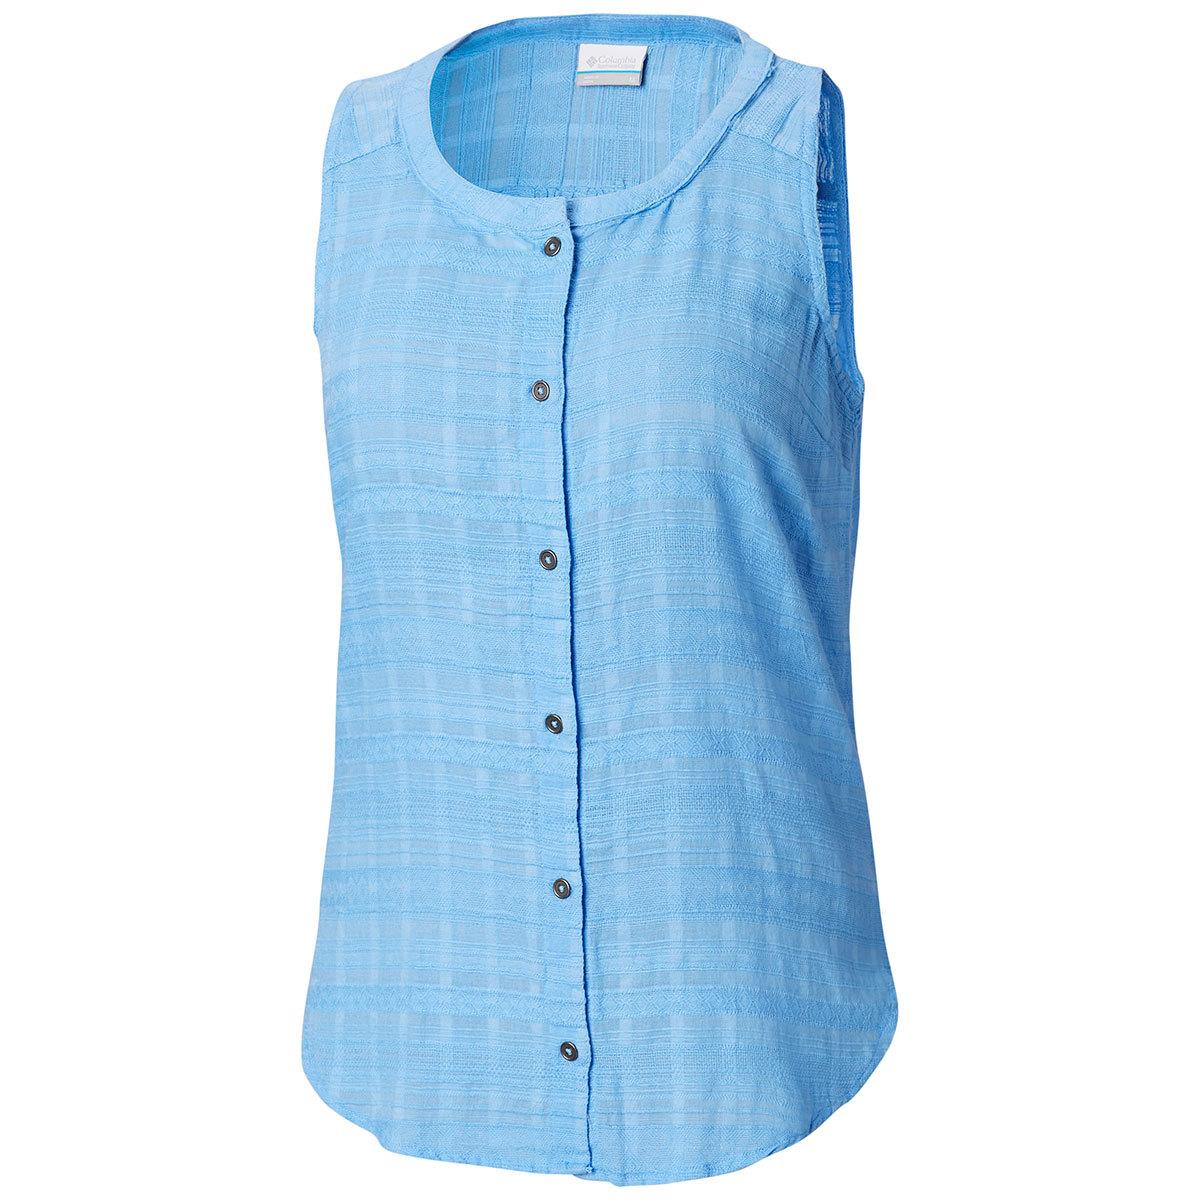 Columbia Women's Summer Ease Sleeveless Shirt - White, L